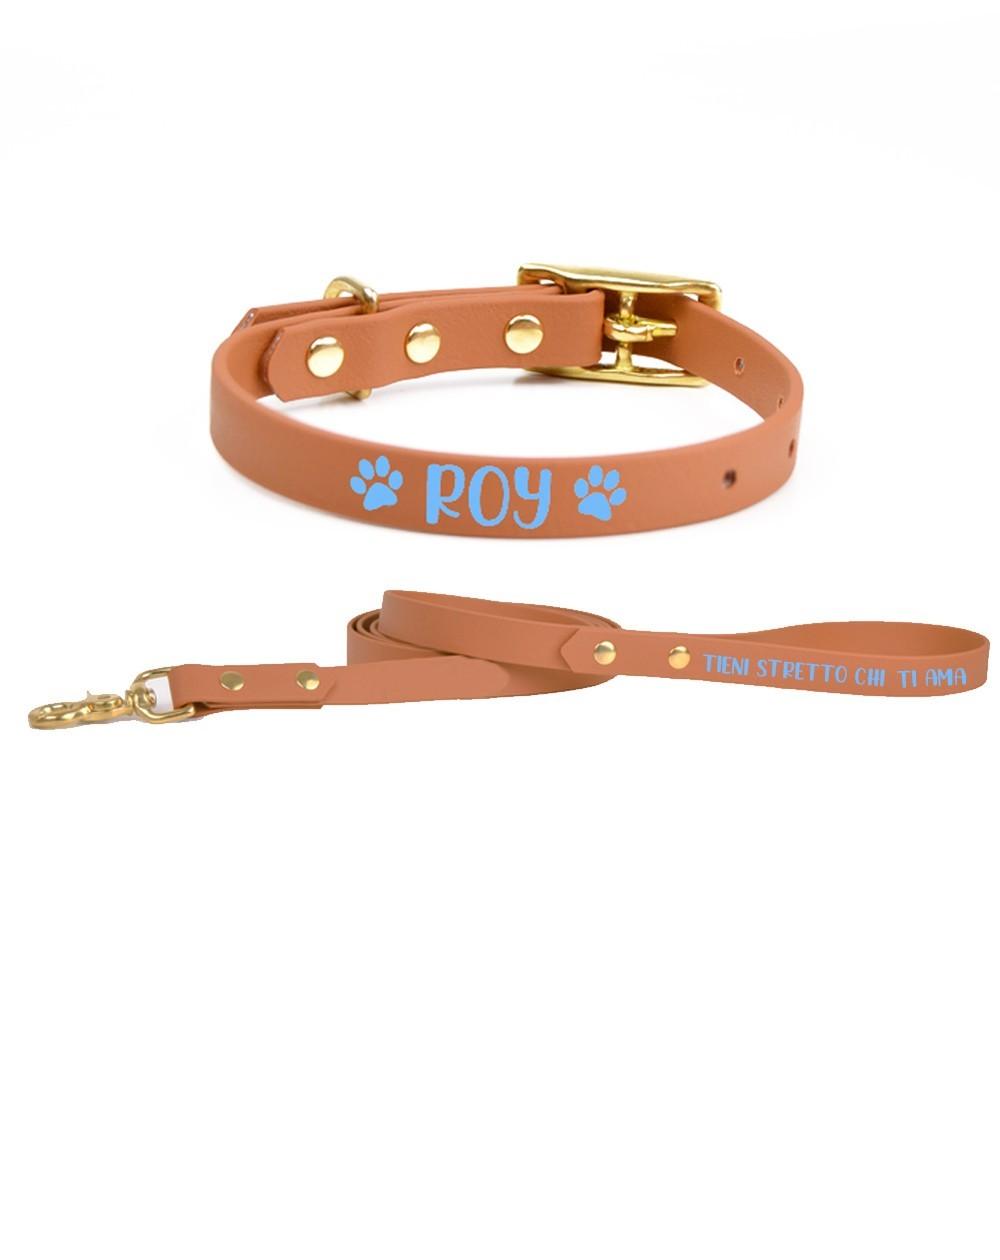 Personalized collar and leash Celescuo